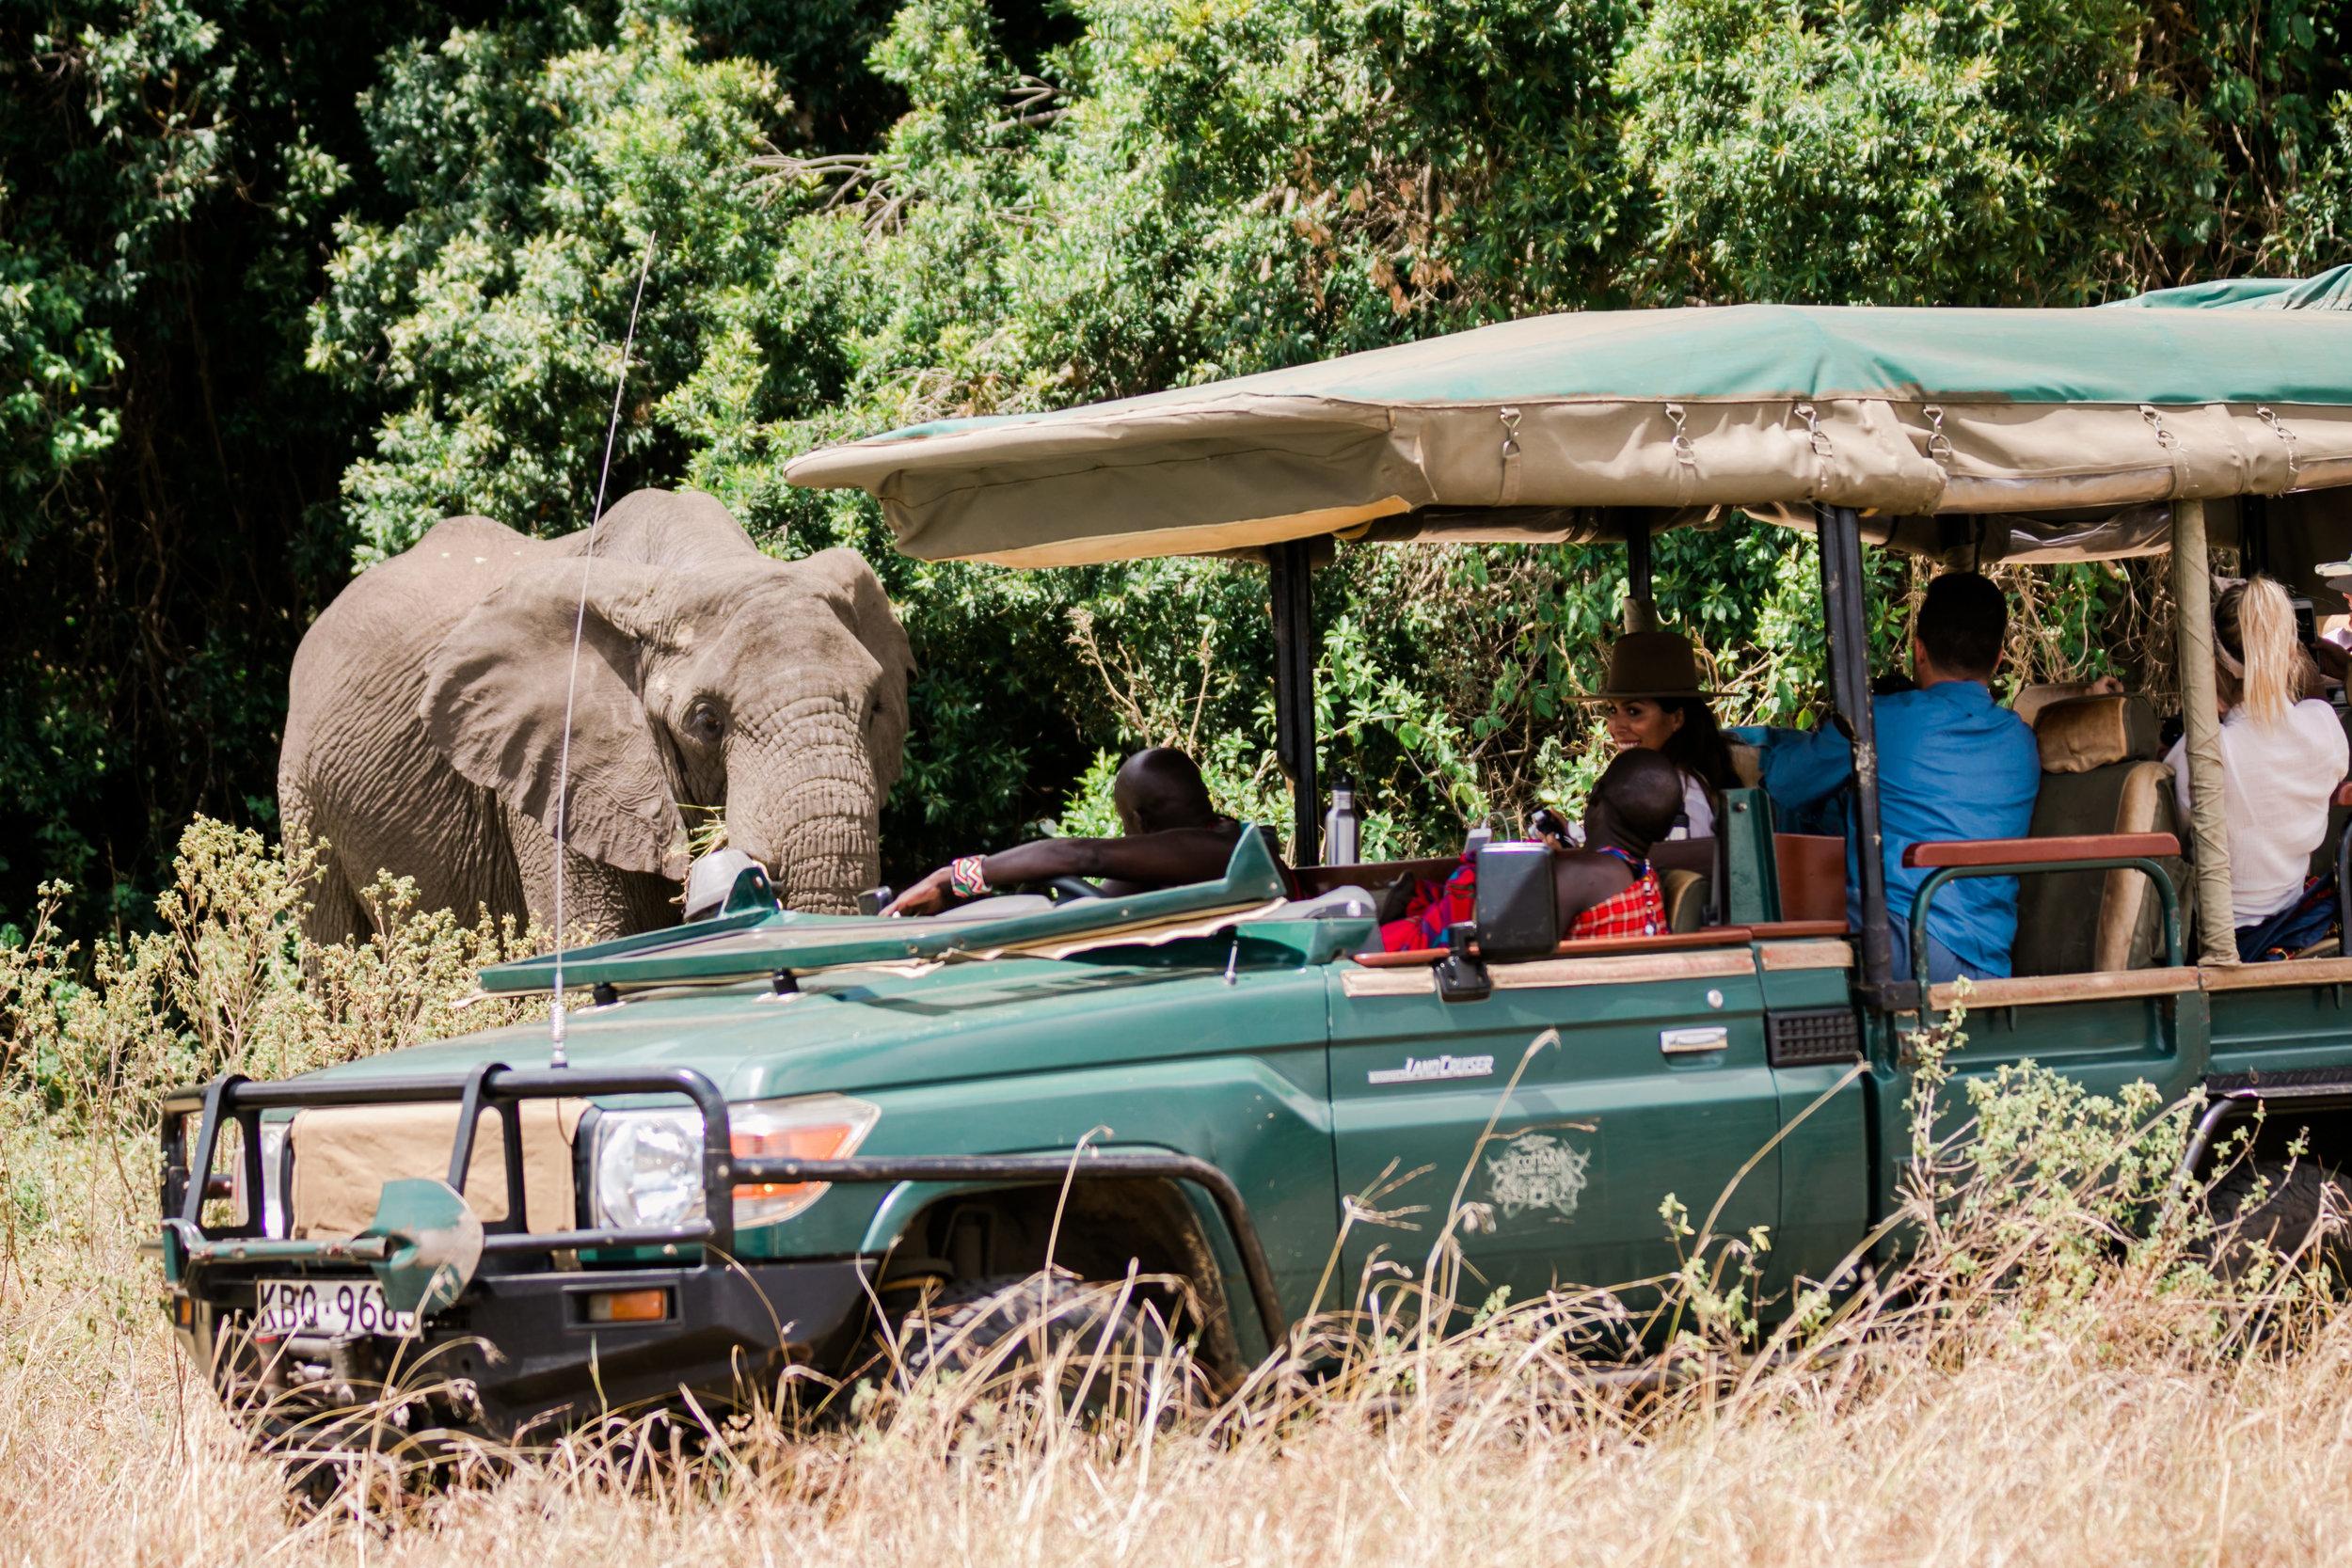 Elephant Spotting - Cottars Kenya Safari Ph. Valorie Darling